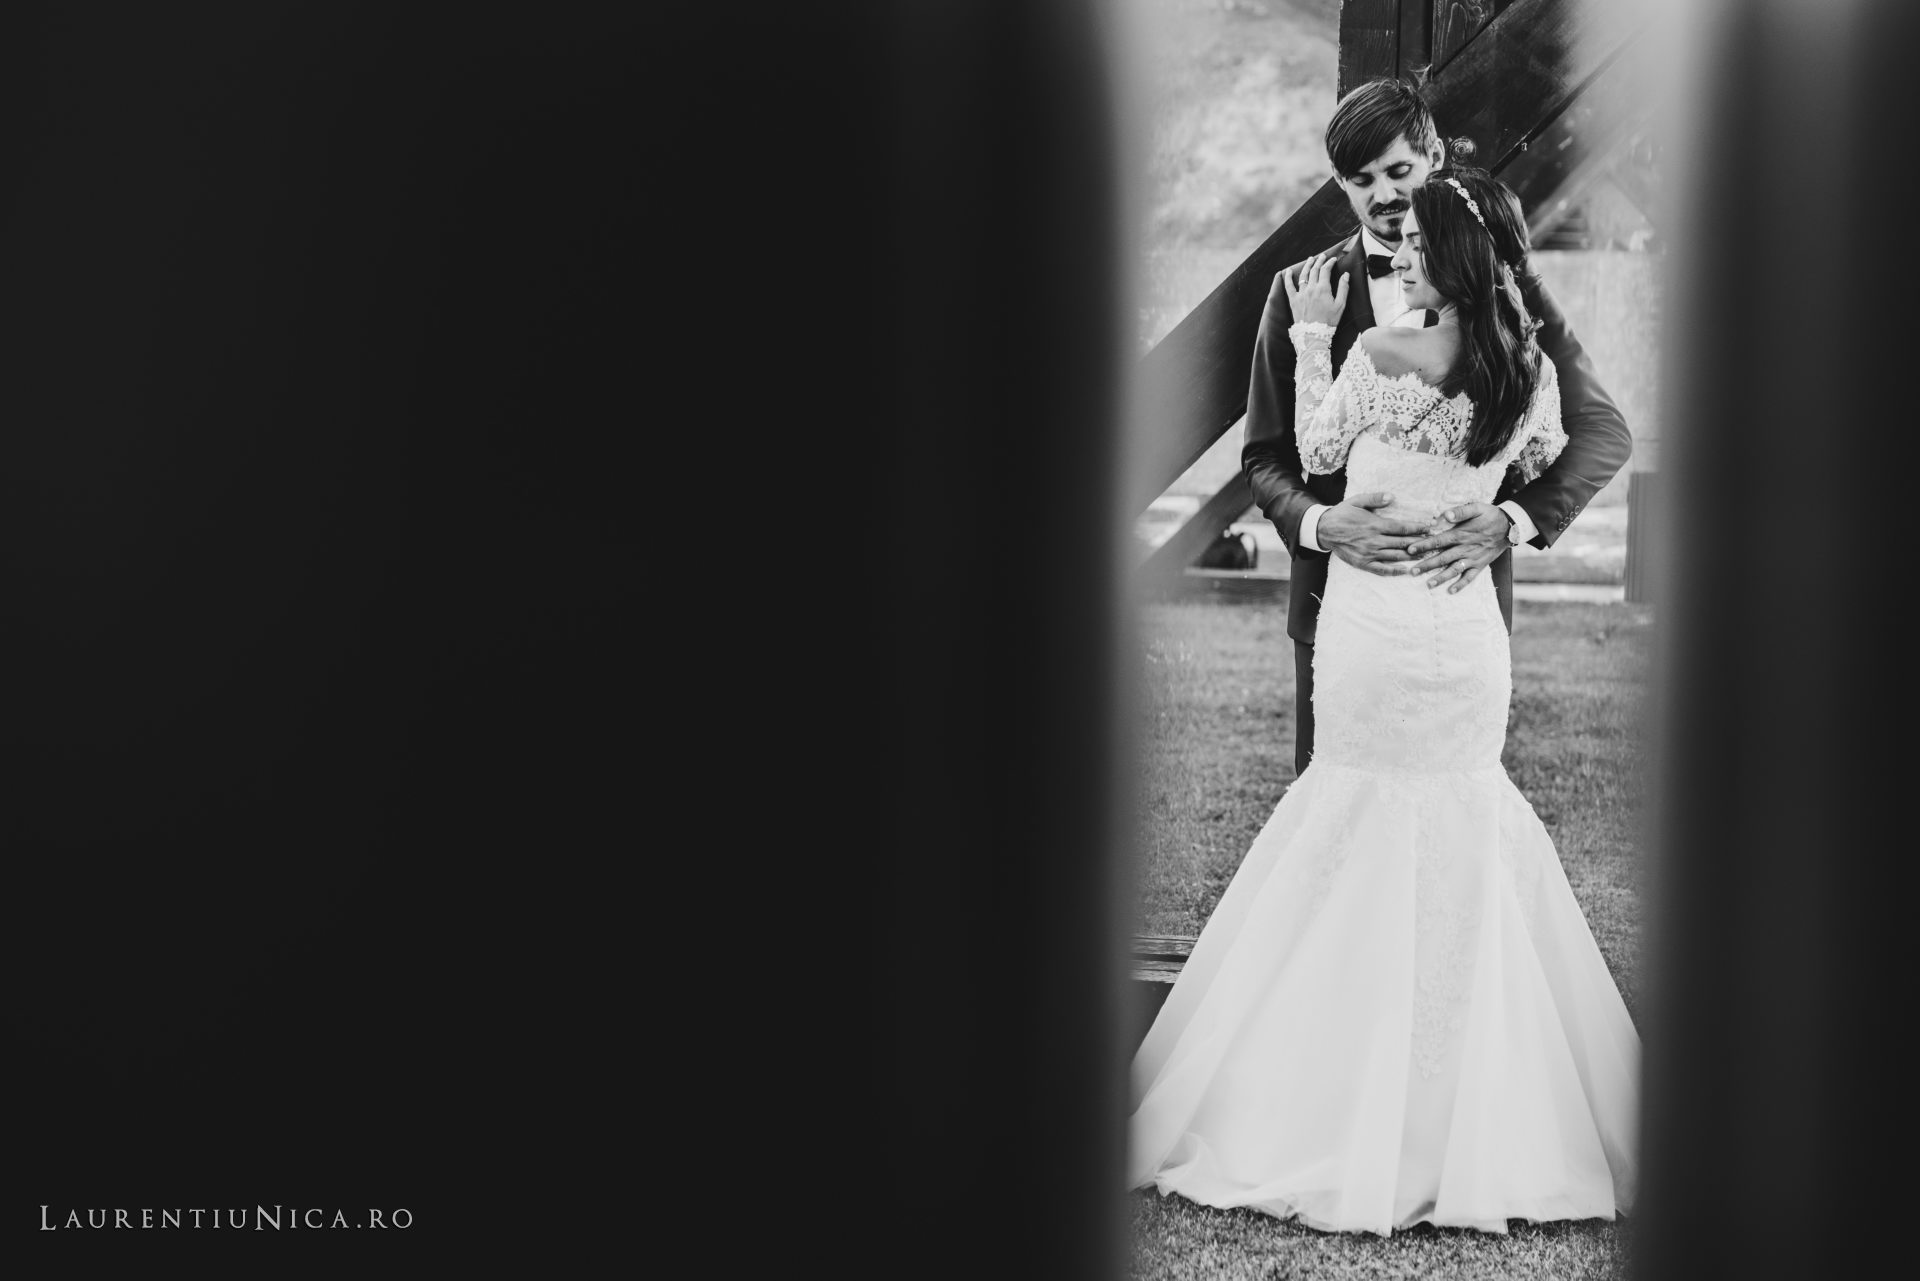 cristina_si_ovidiu-after-wedding-alba-iulia_fotograf_laurentiu_nica_33